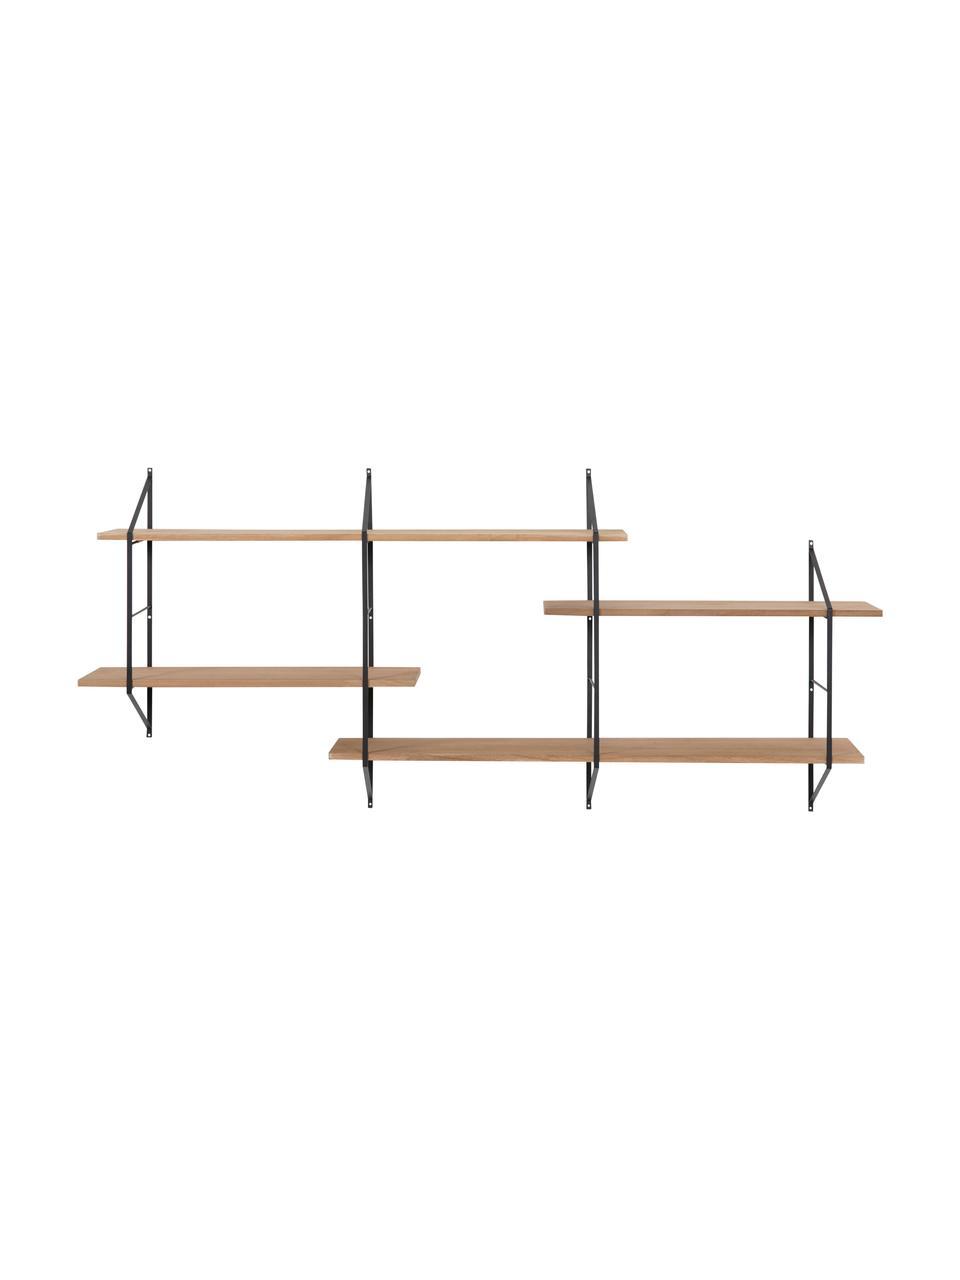 Großes Wandregal Belfast mit Metallgestell, Gestell: Metall, pulverbeschichtet, Schwarz, Hellbraun, 191 x 79 cm